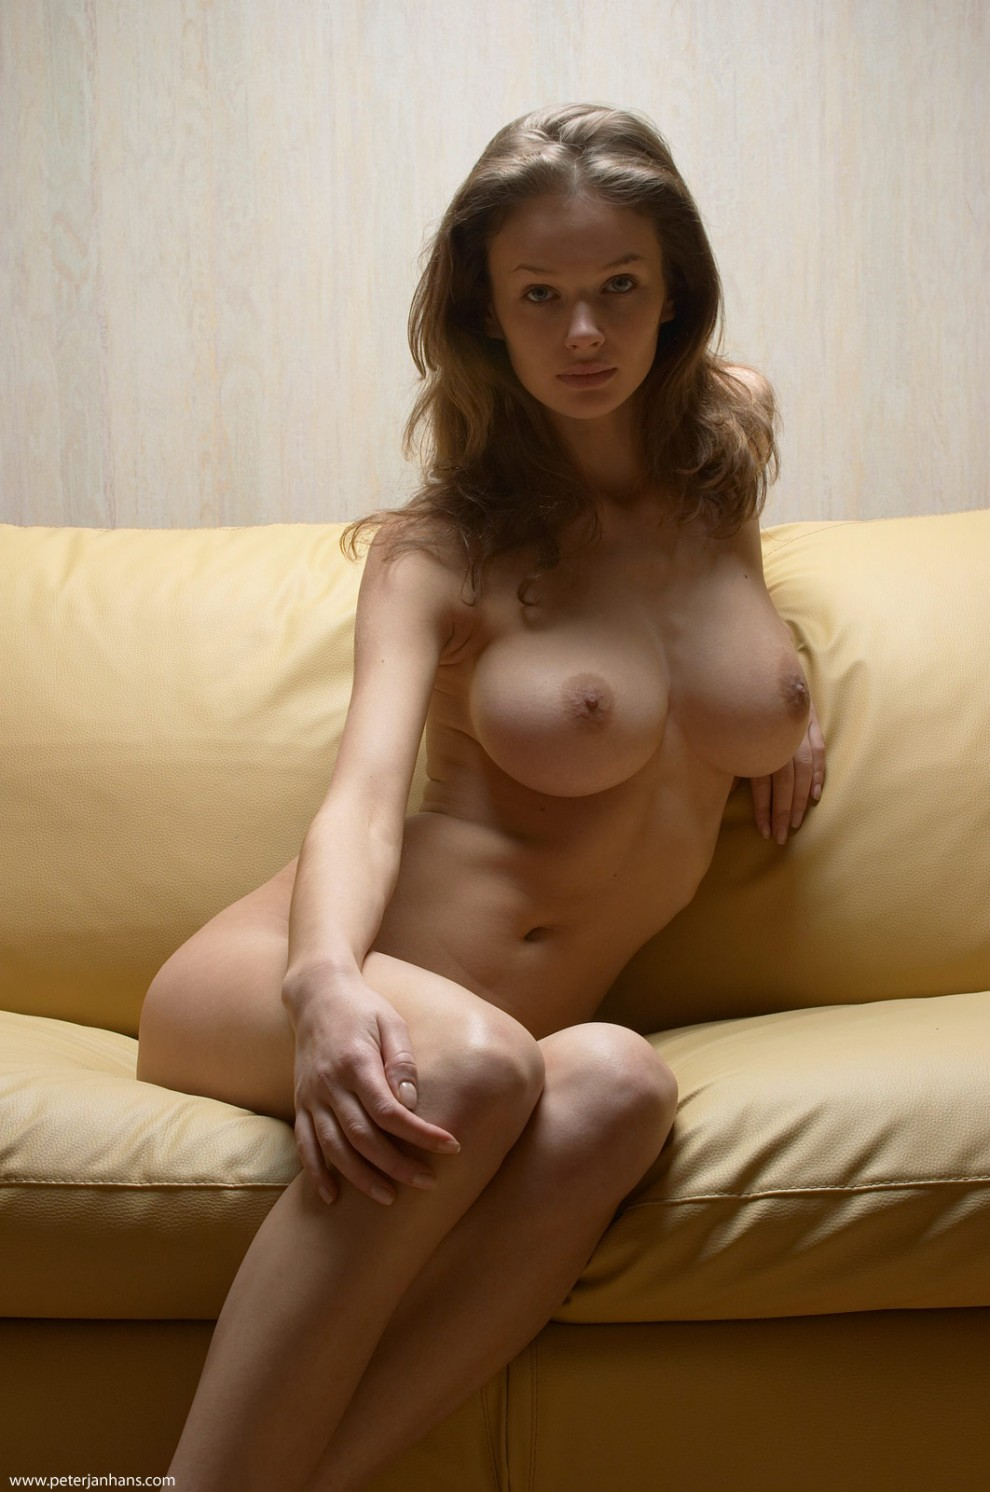 Gool nude wallpapers smut scenes